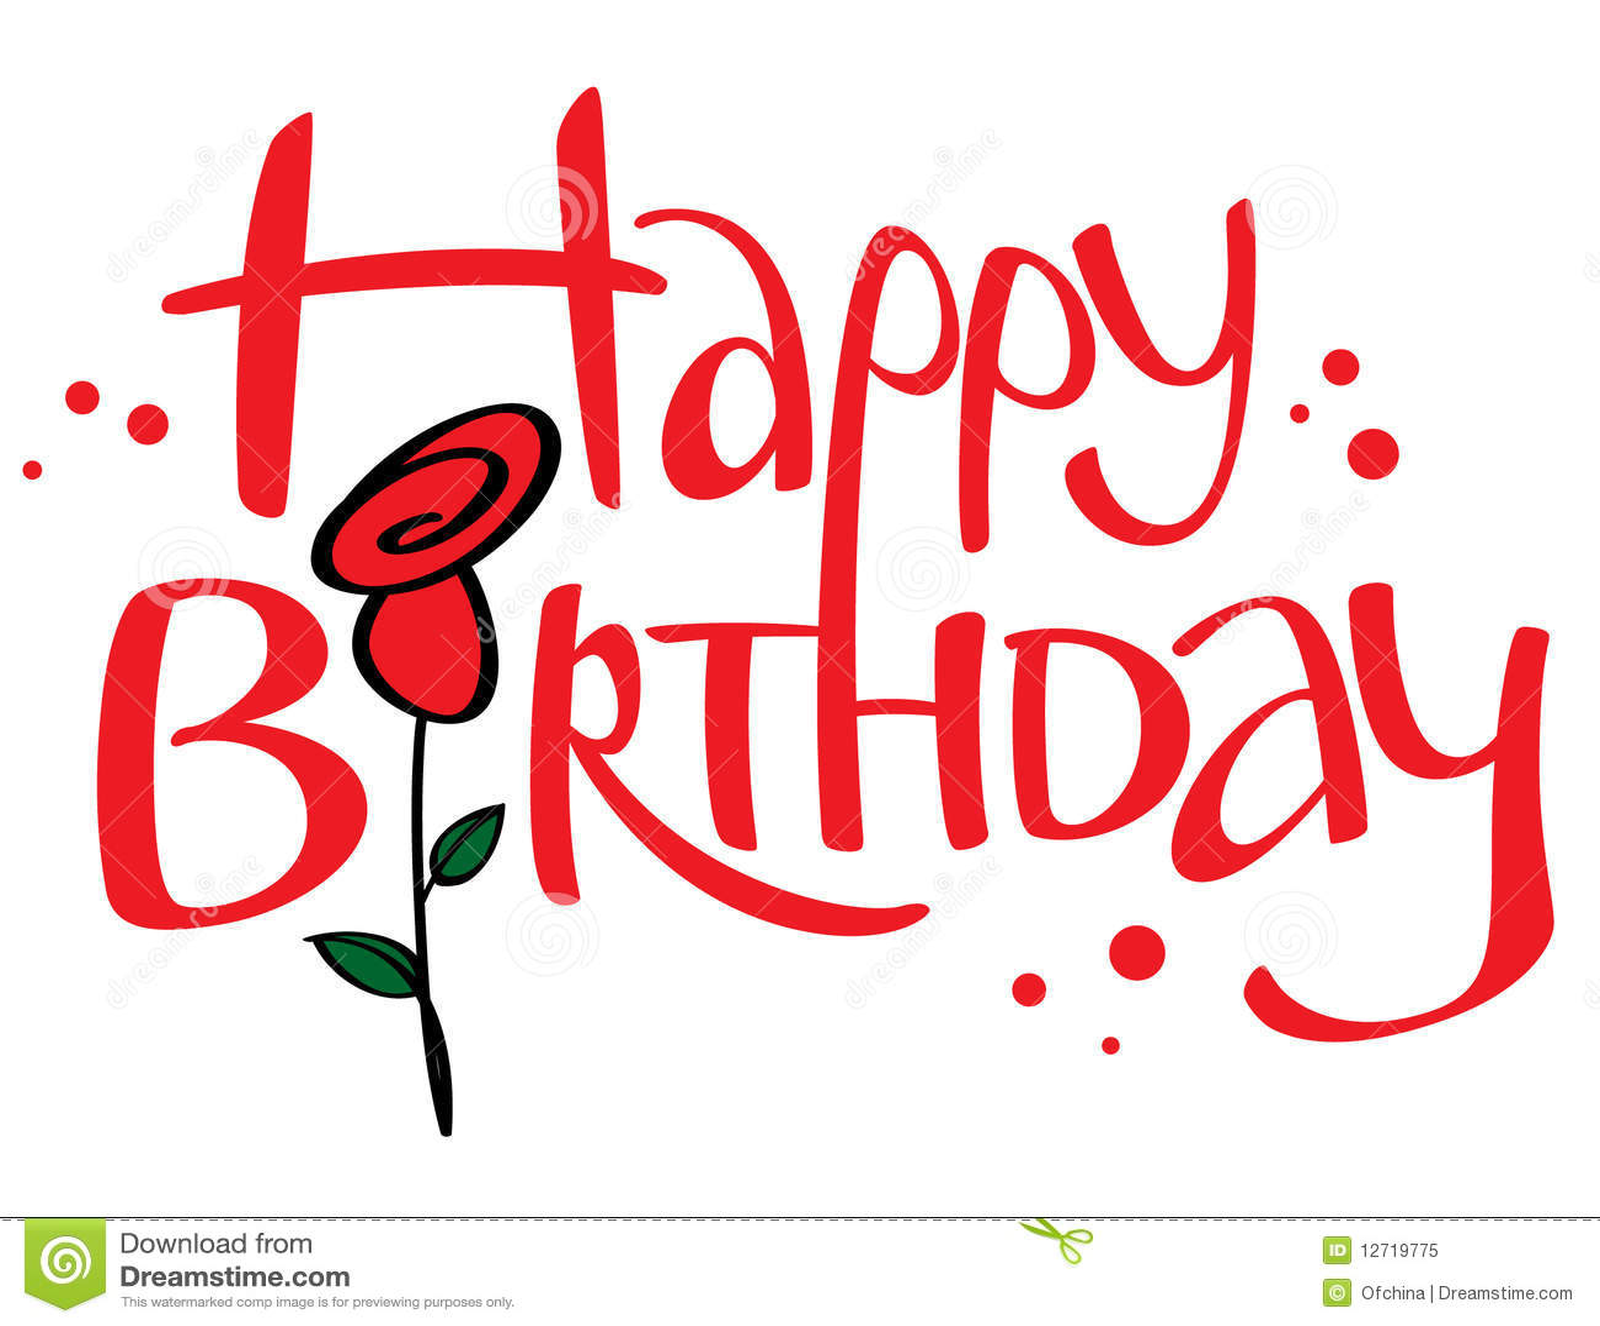 Happy Birthday Royalty Free Stock Photo - Image: 12719775